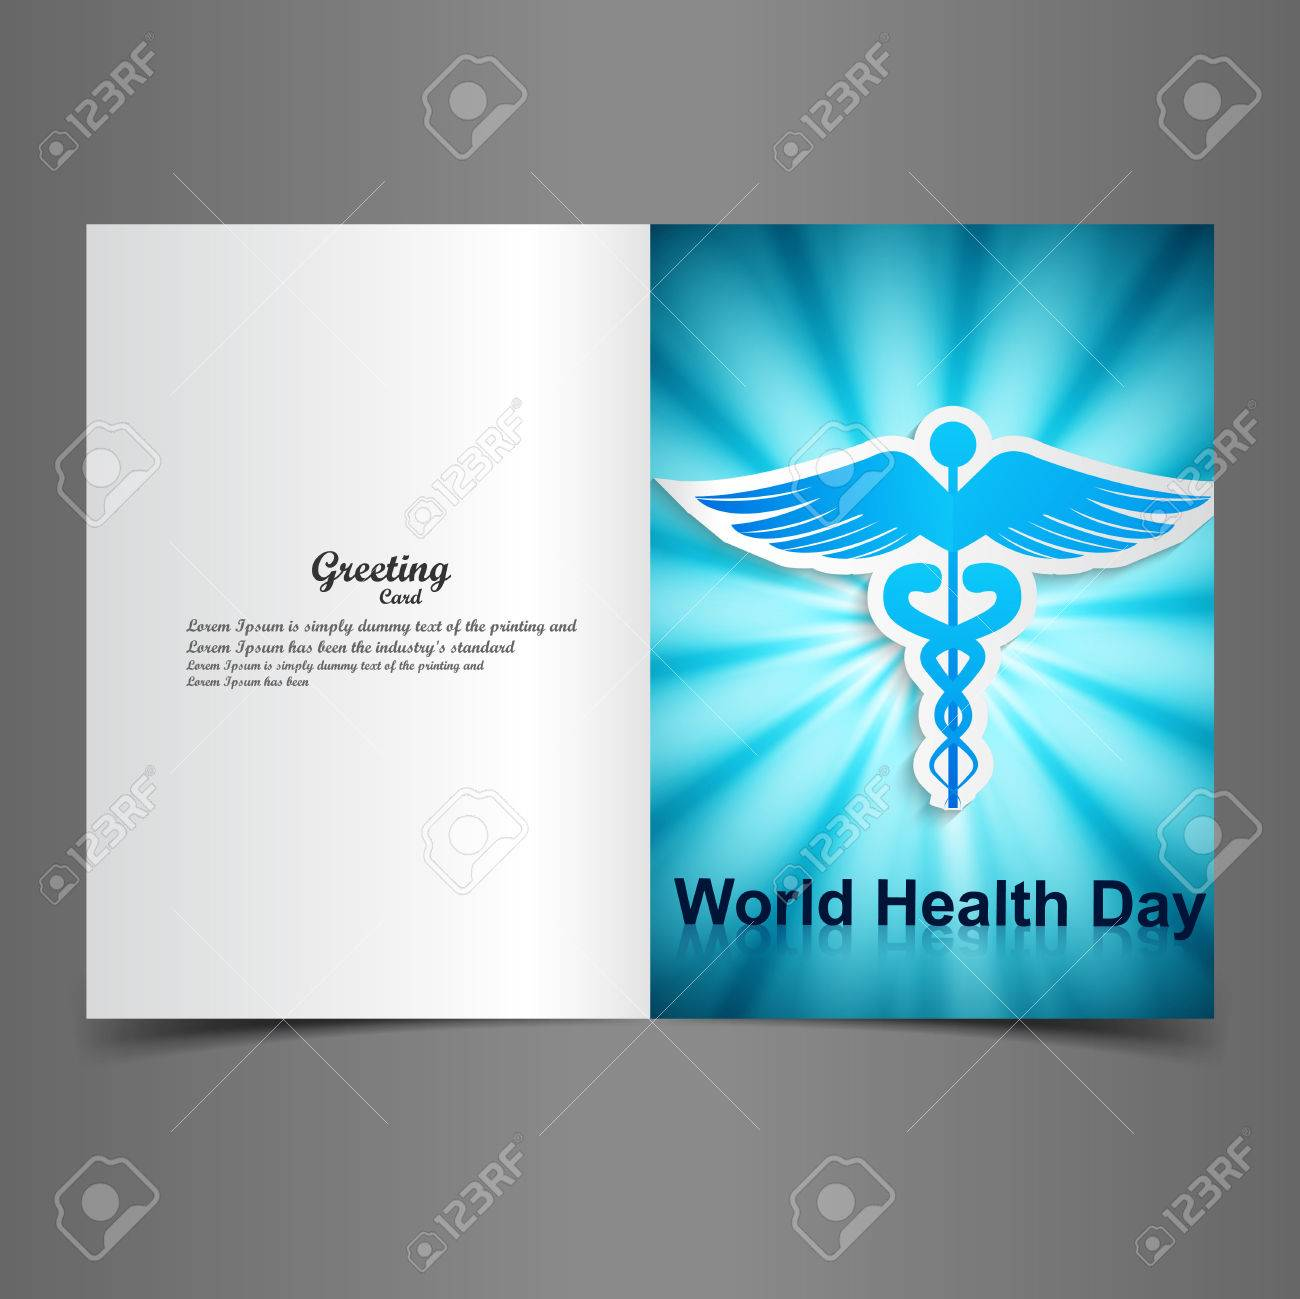 World health day greeting card beautiful caduceus medical symbol illustration vector Stock Vector - 27157597